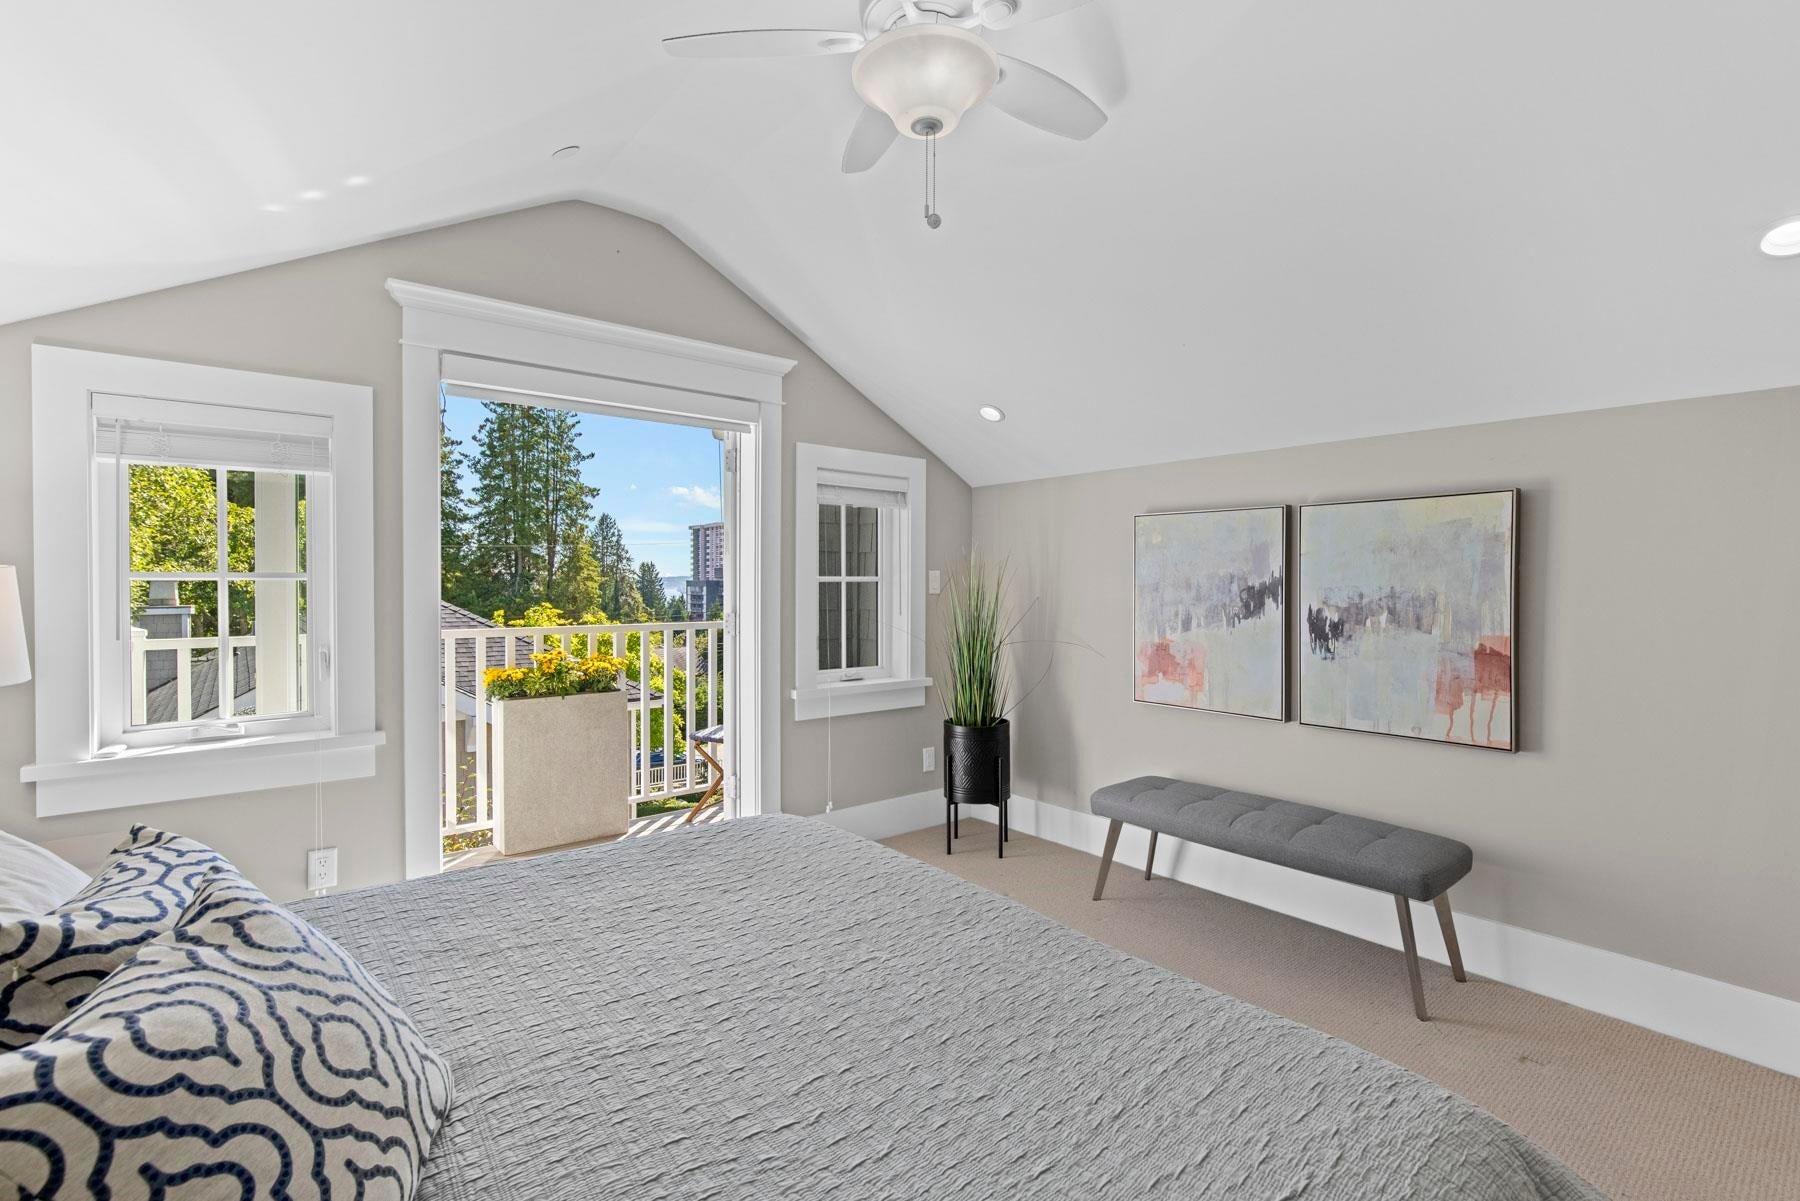 1421 GORDON AVENUE - Ambleside House/Single Family for sale, 3 Bedrooms (R2617756) - #9